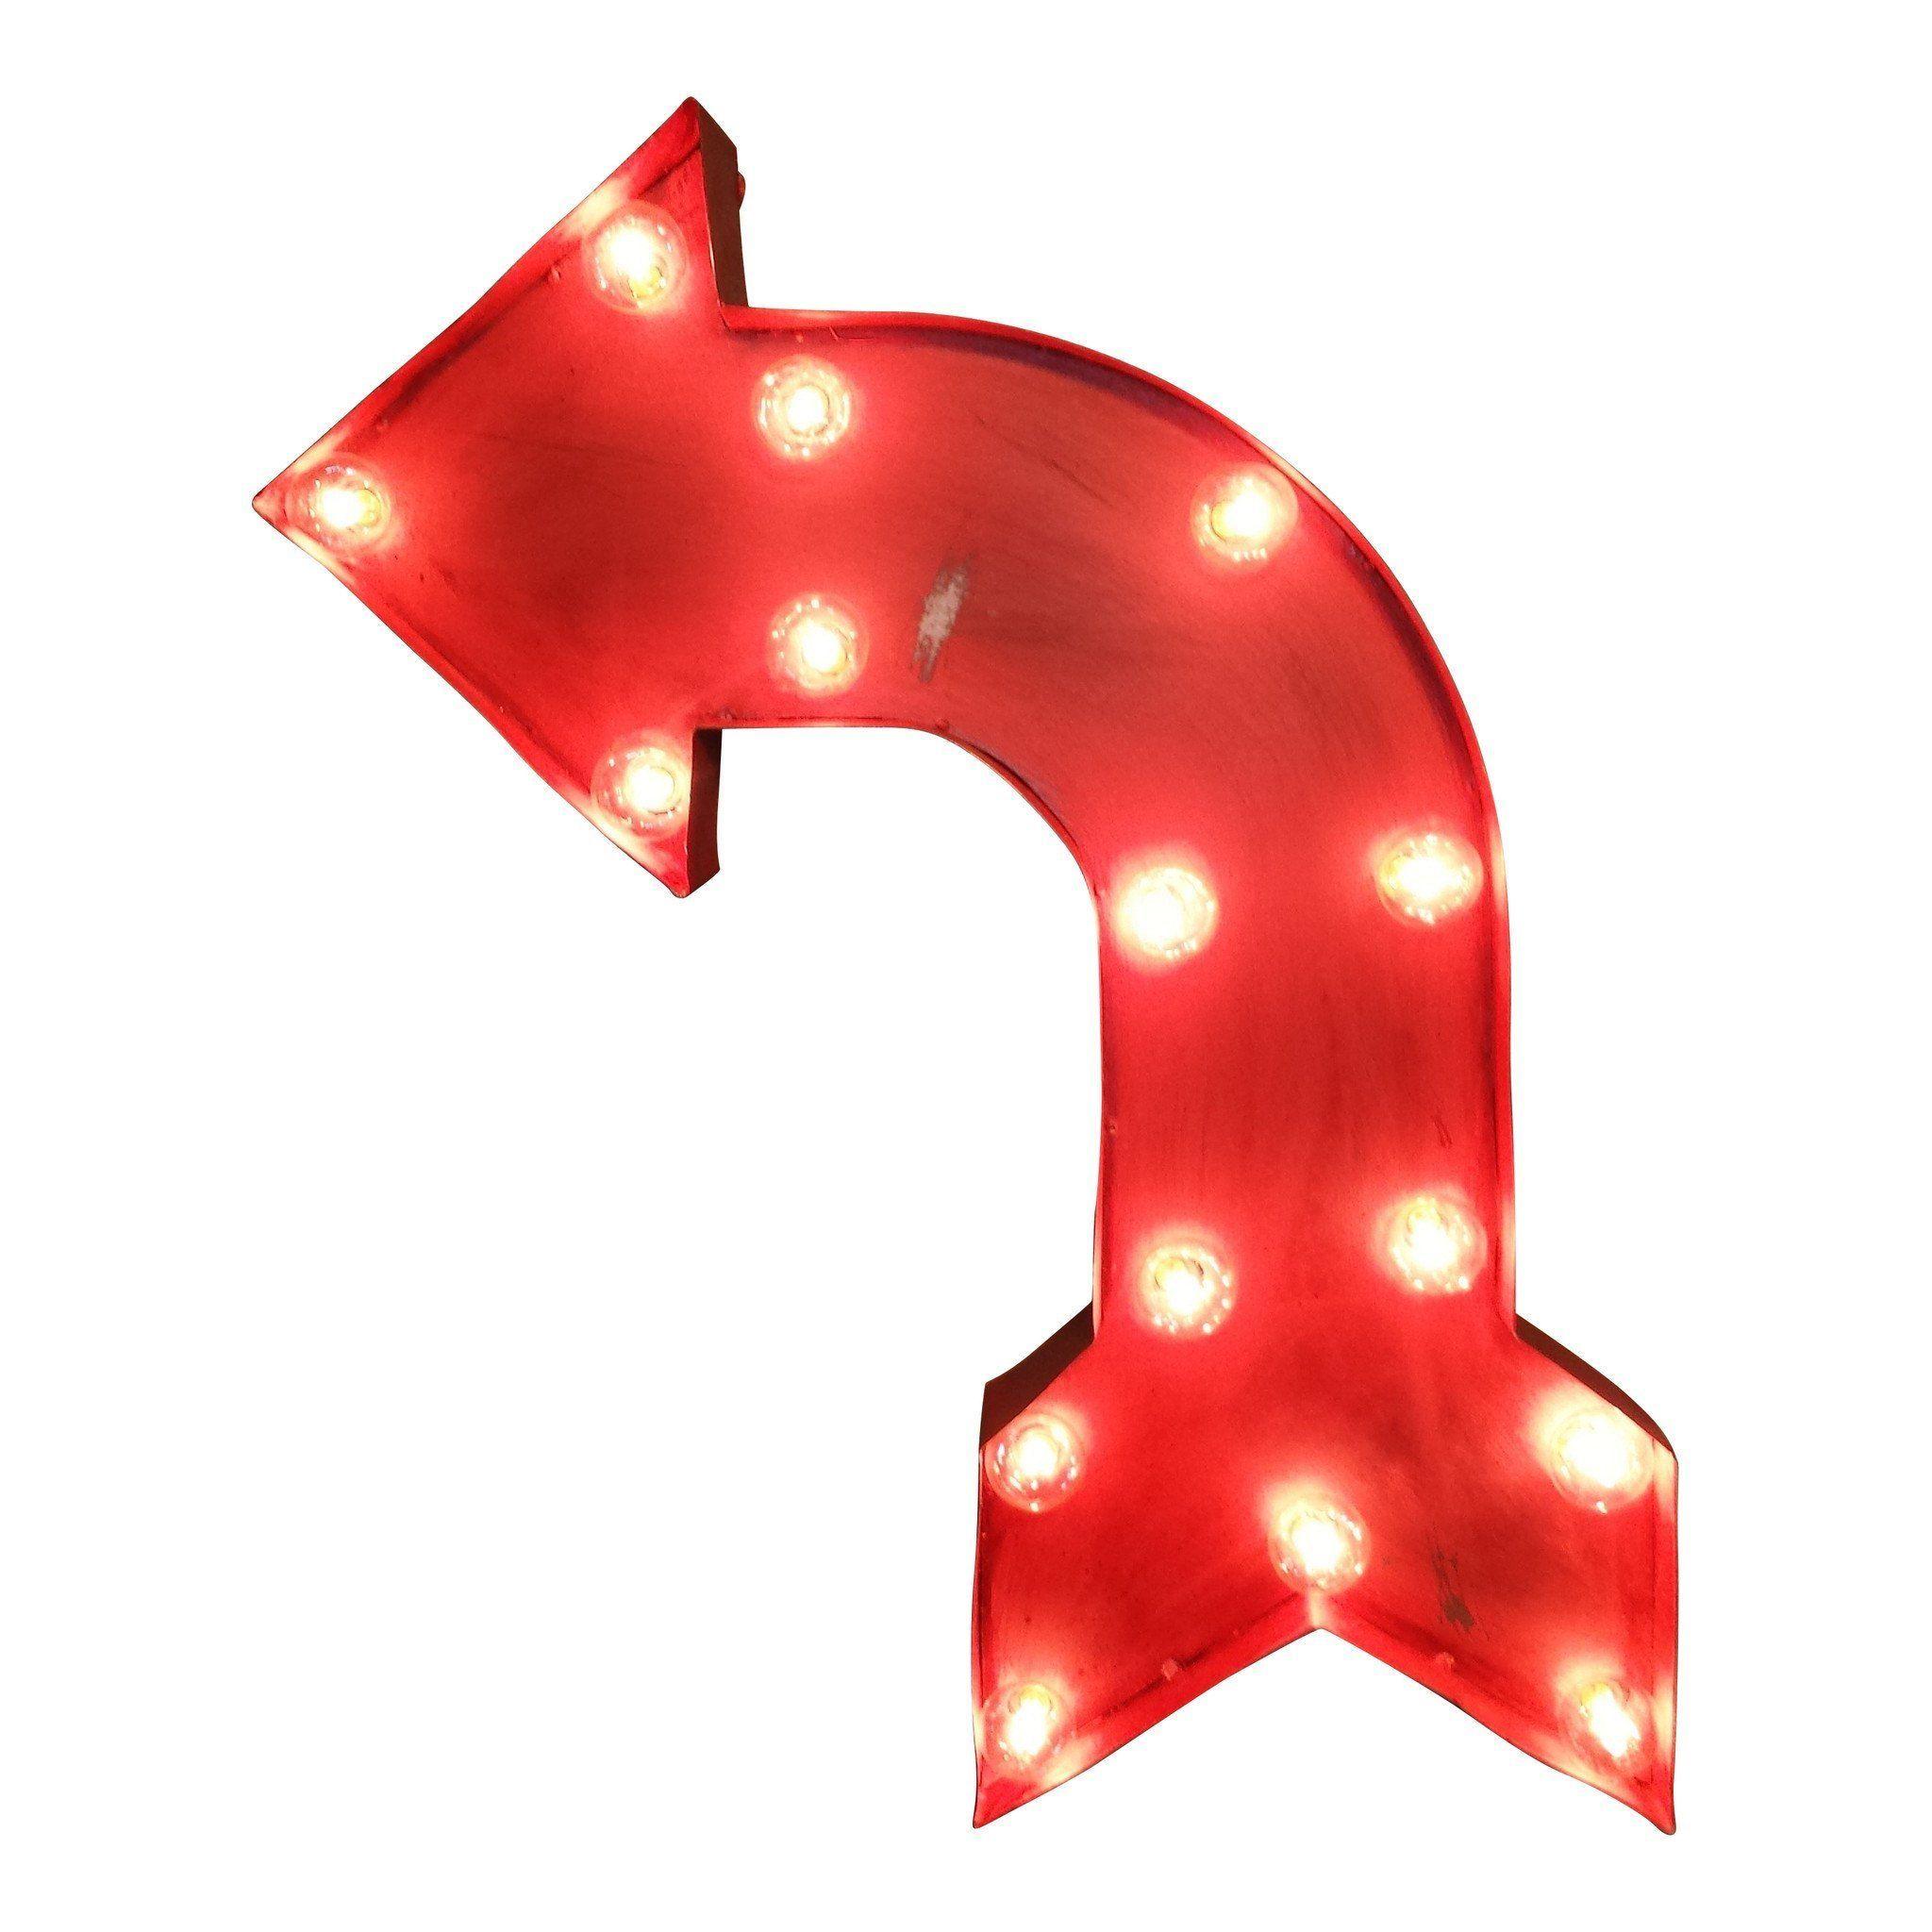 Marquee Symbol Lights - Bent Arrow Symbol Marquee Sign ...